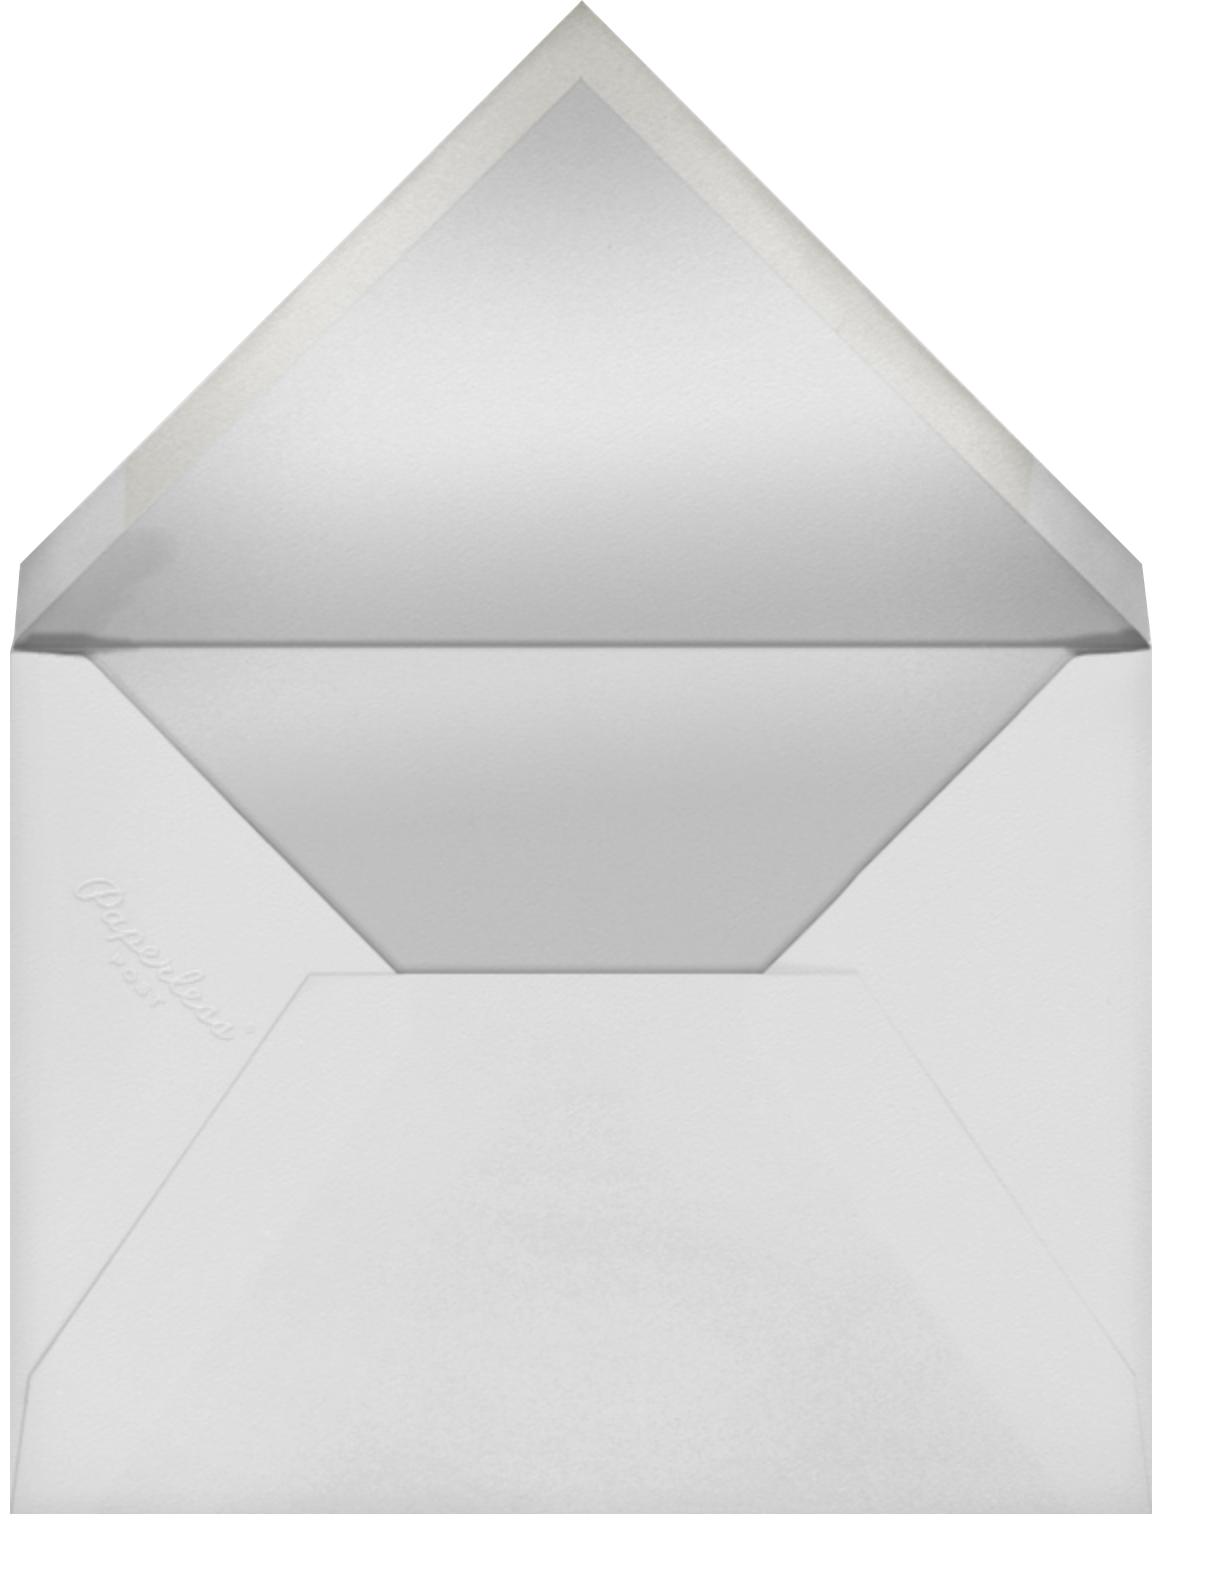 City Lights II (Menu) - kate spade new york - Menus and programs - envelope back